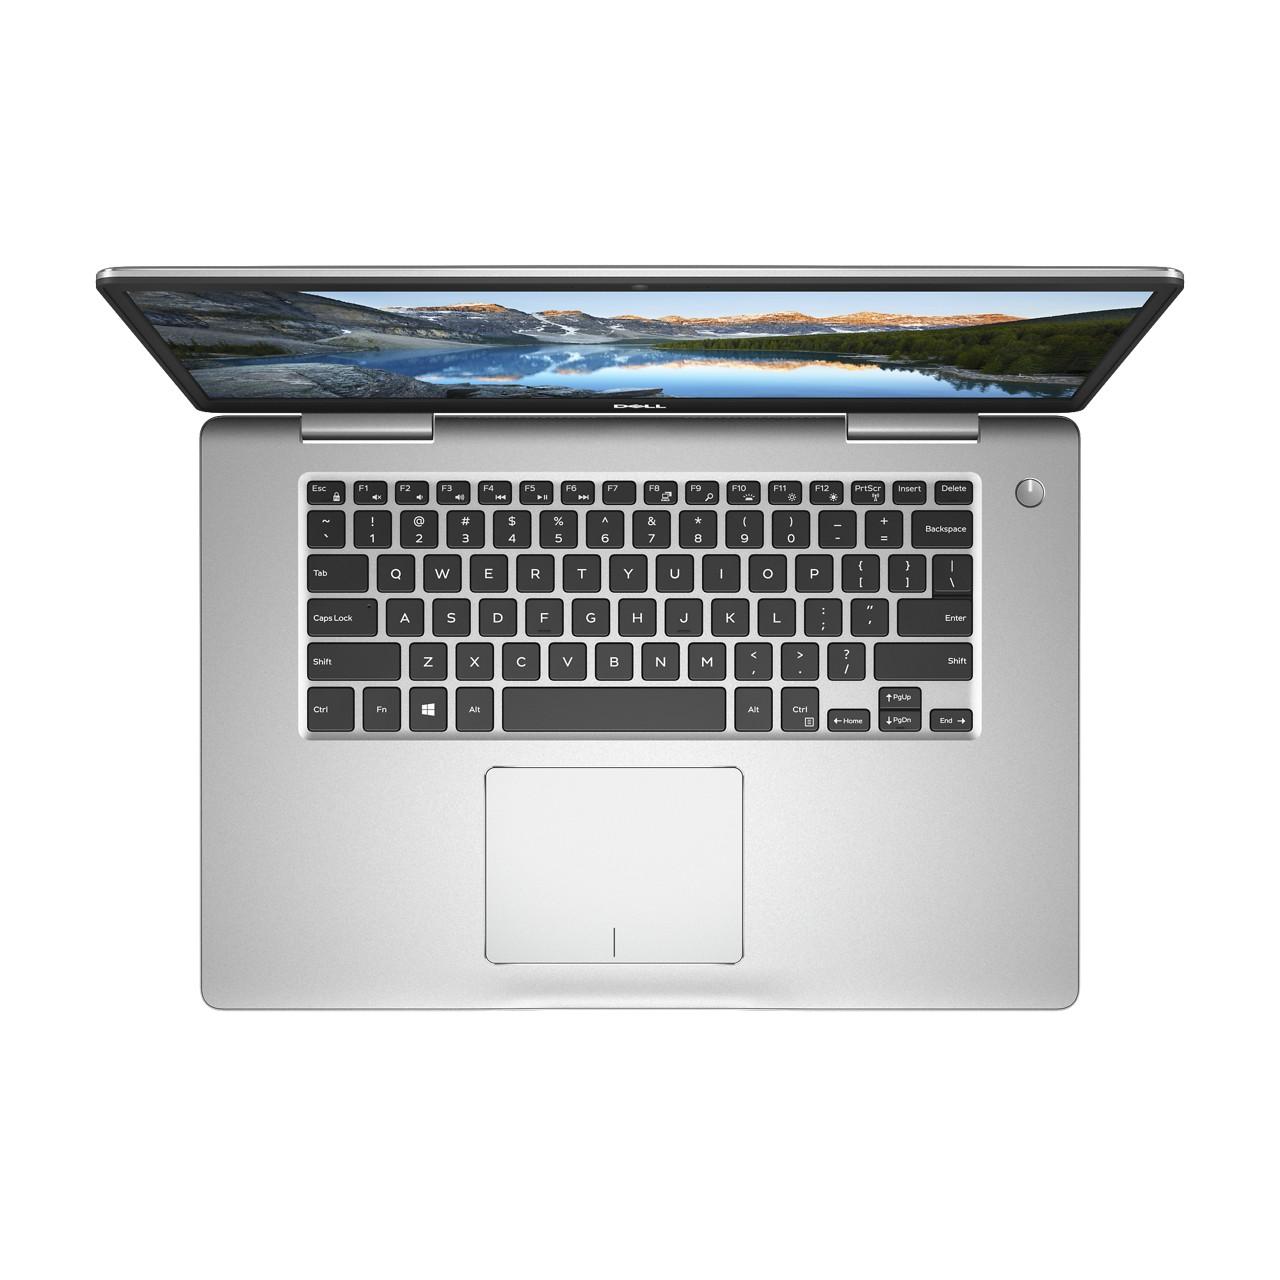 Dell Inspiron 15 7580 Laptop 15 6